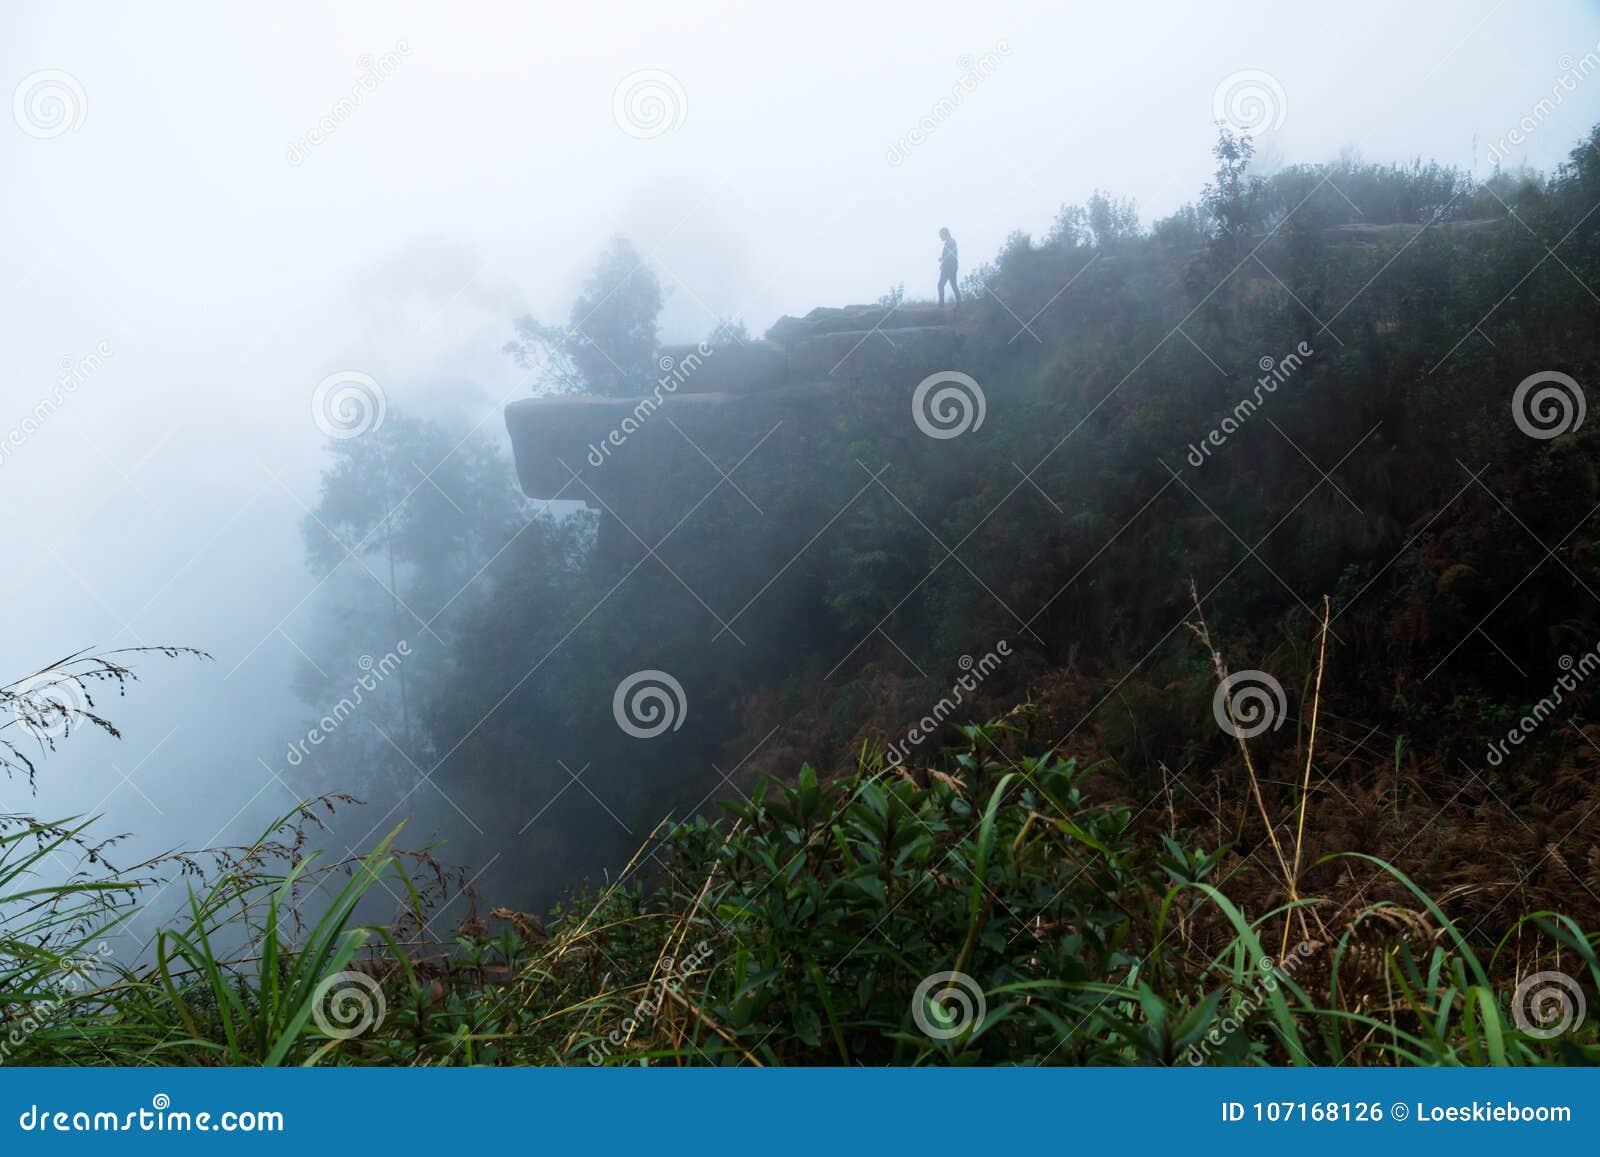 Dolphins nose rock in fog in Kodaikanal, India